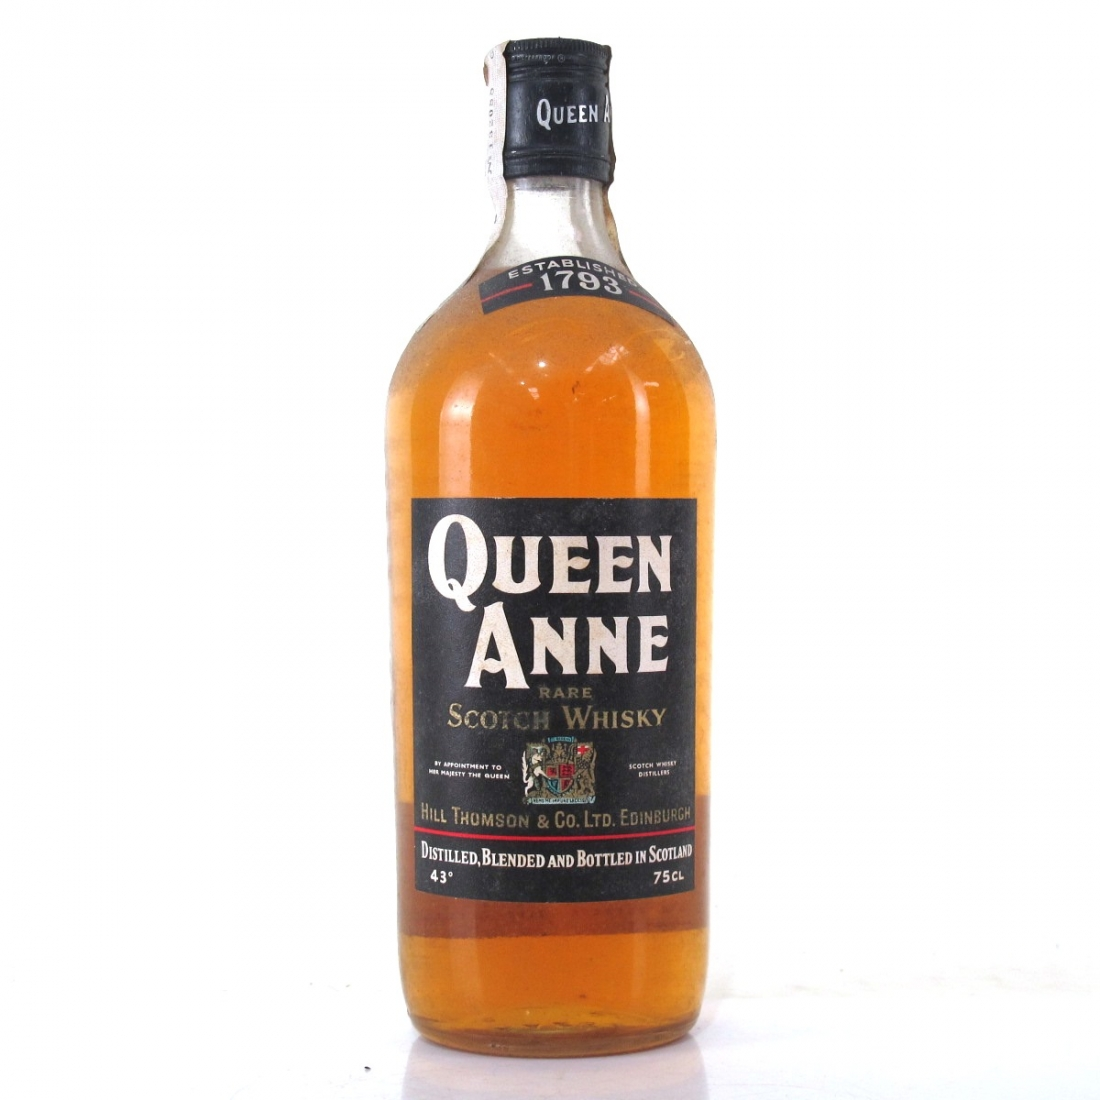 Queen Anne Rare Scotch Circa 1970s / Portuguese Import